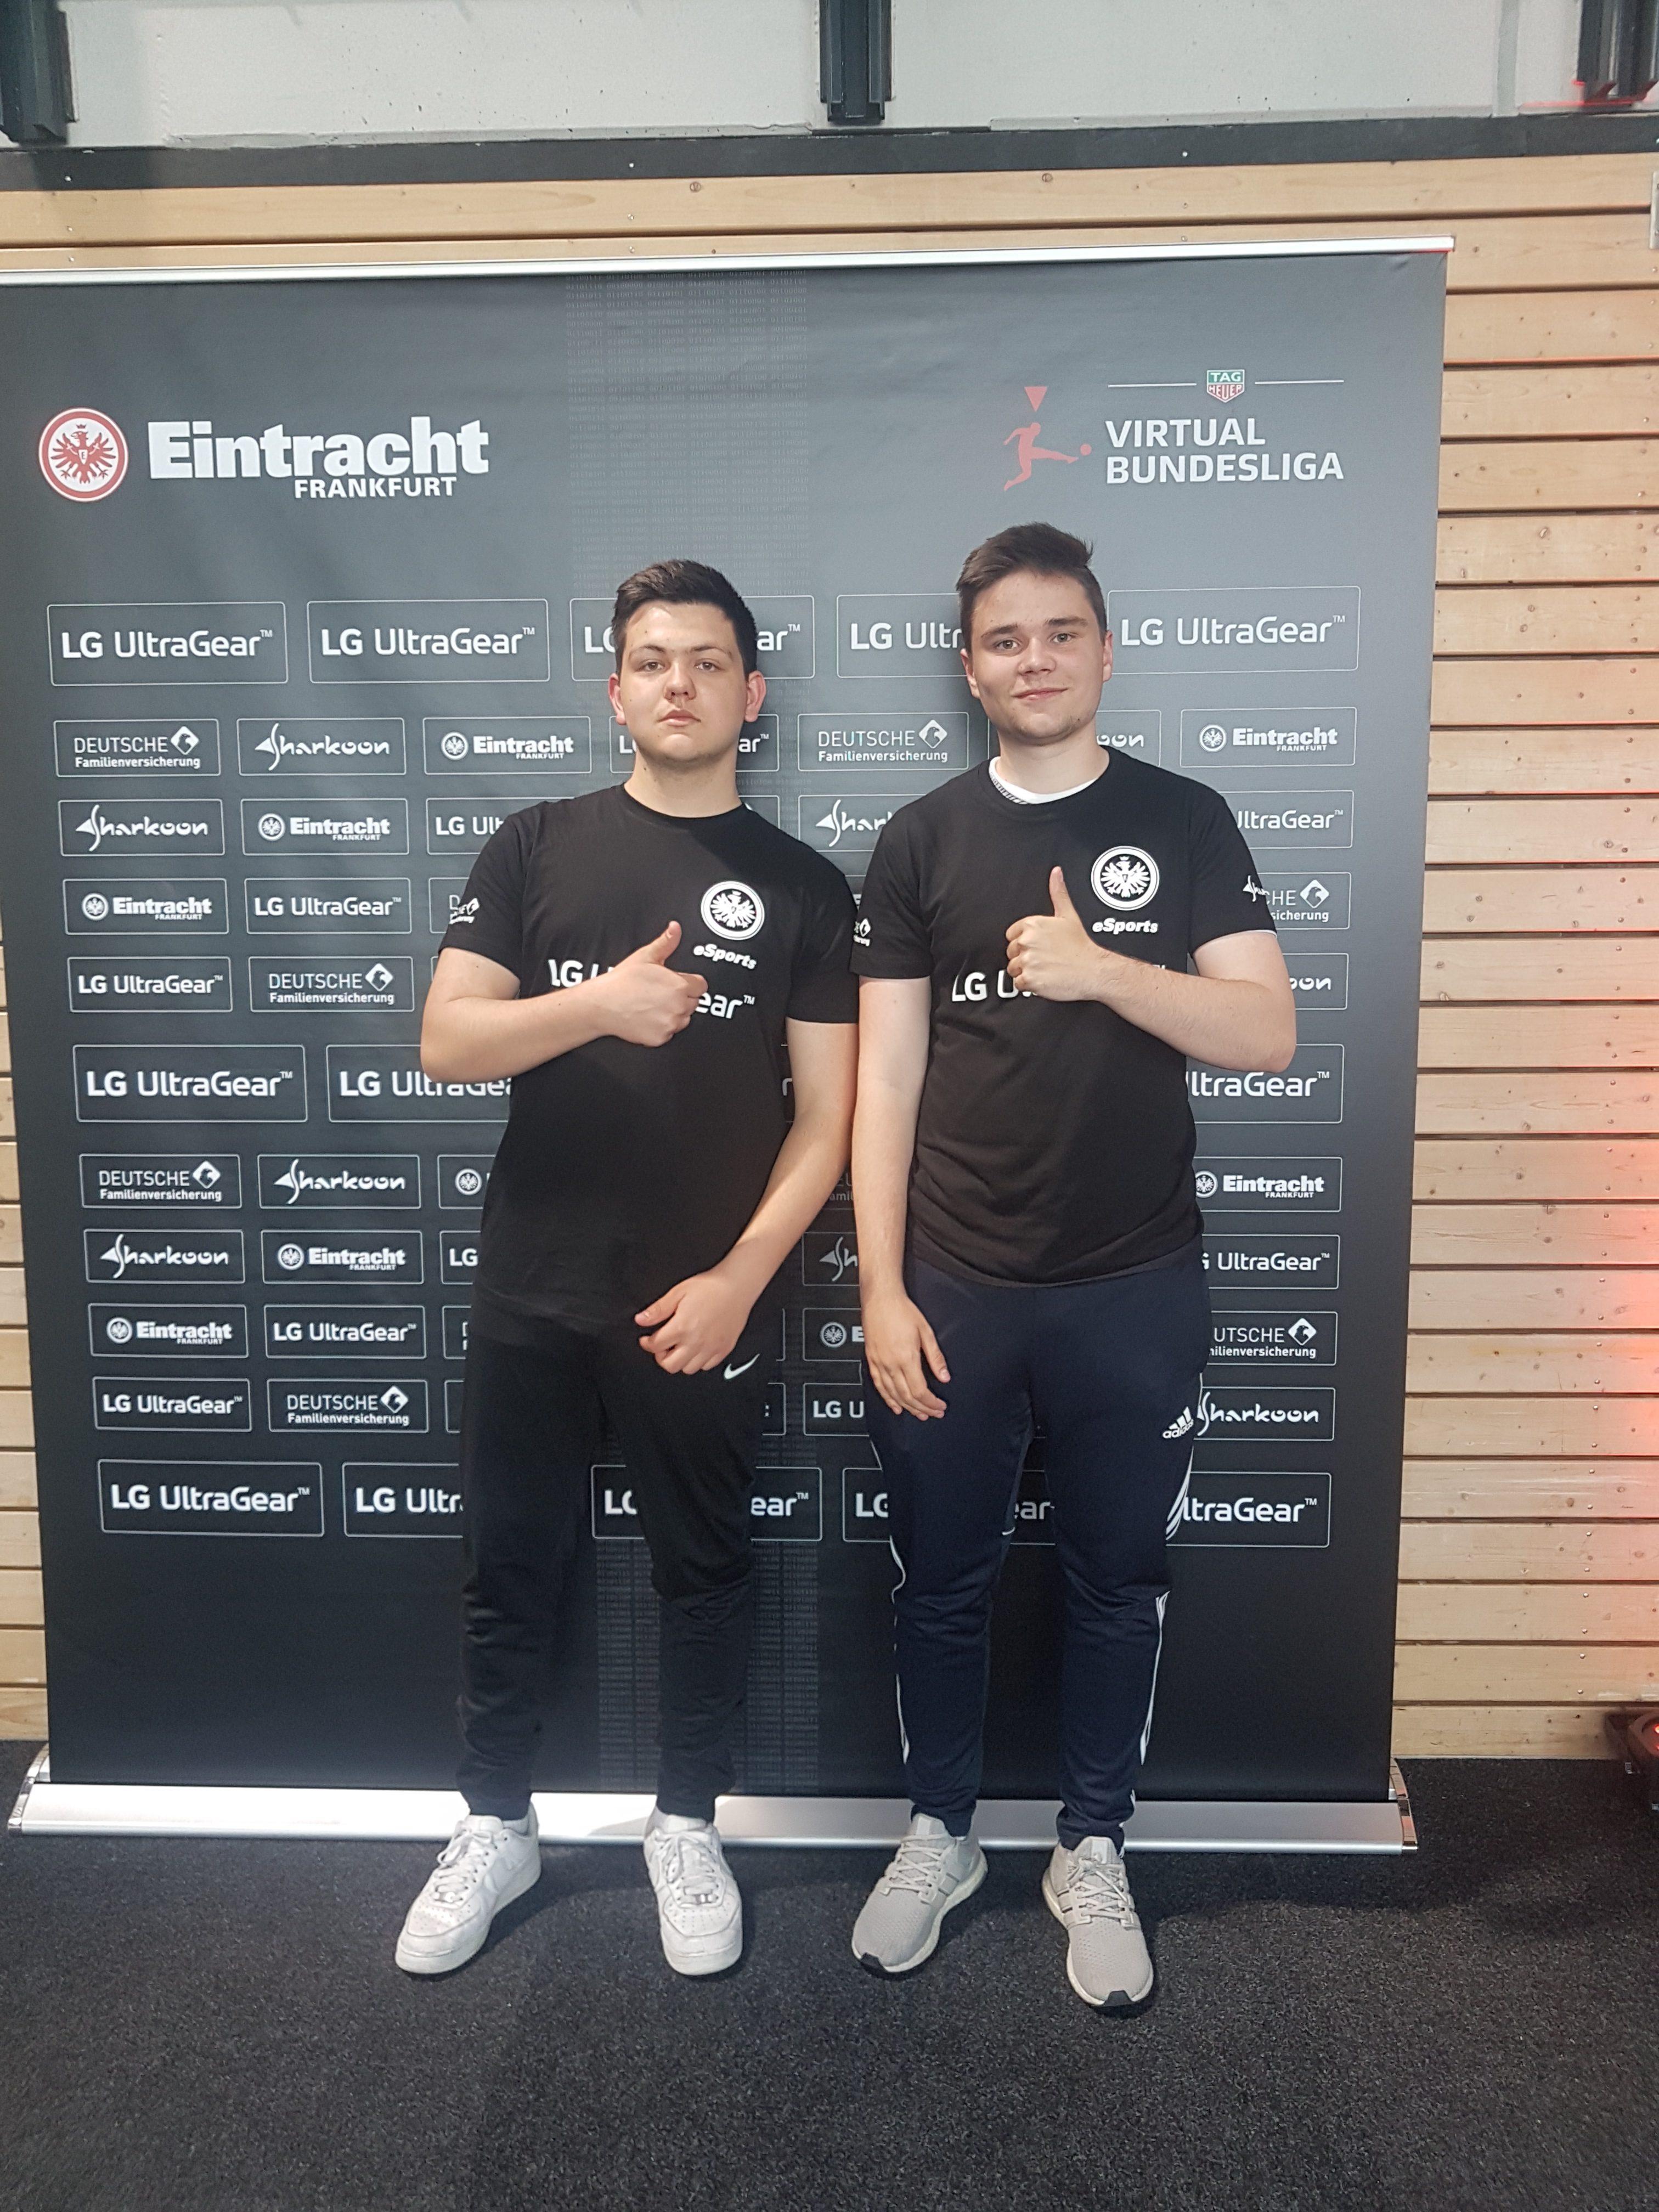 Eintracht Frankfurt eSports kick-off